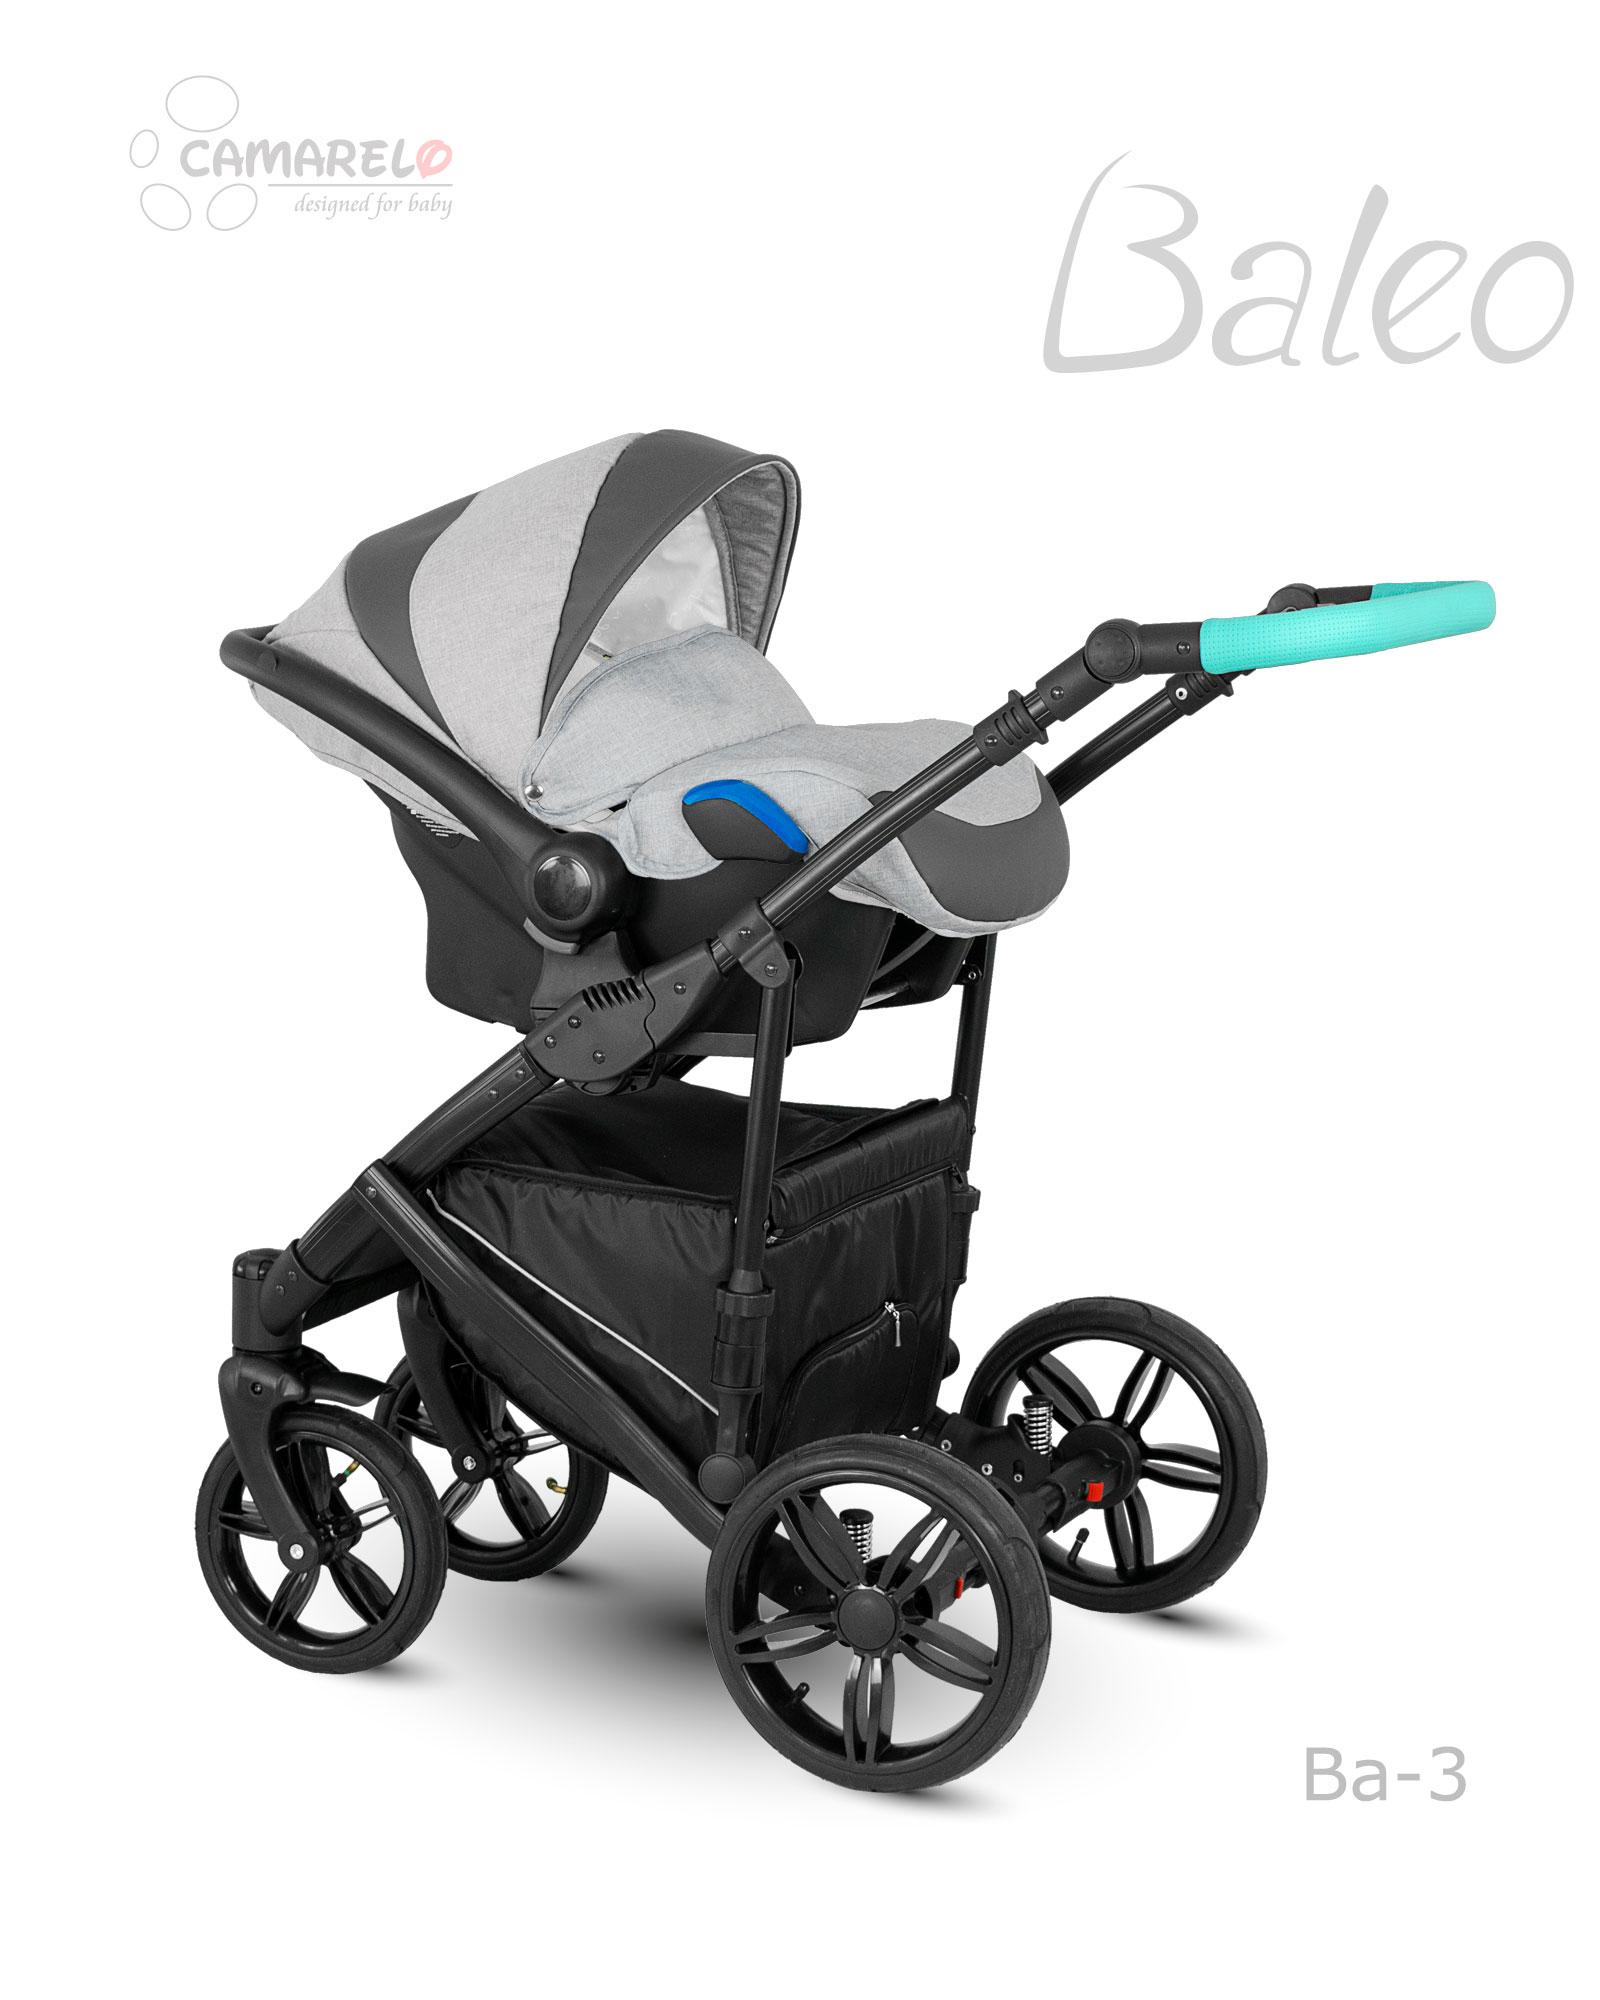 Коляска BALEO BA-3